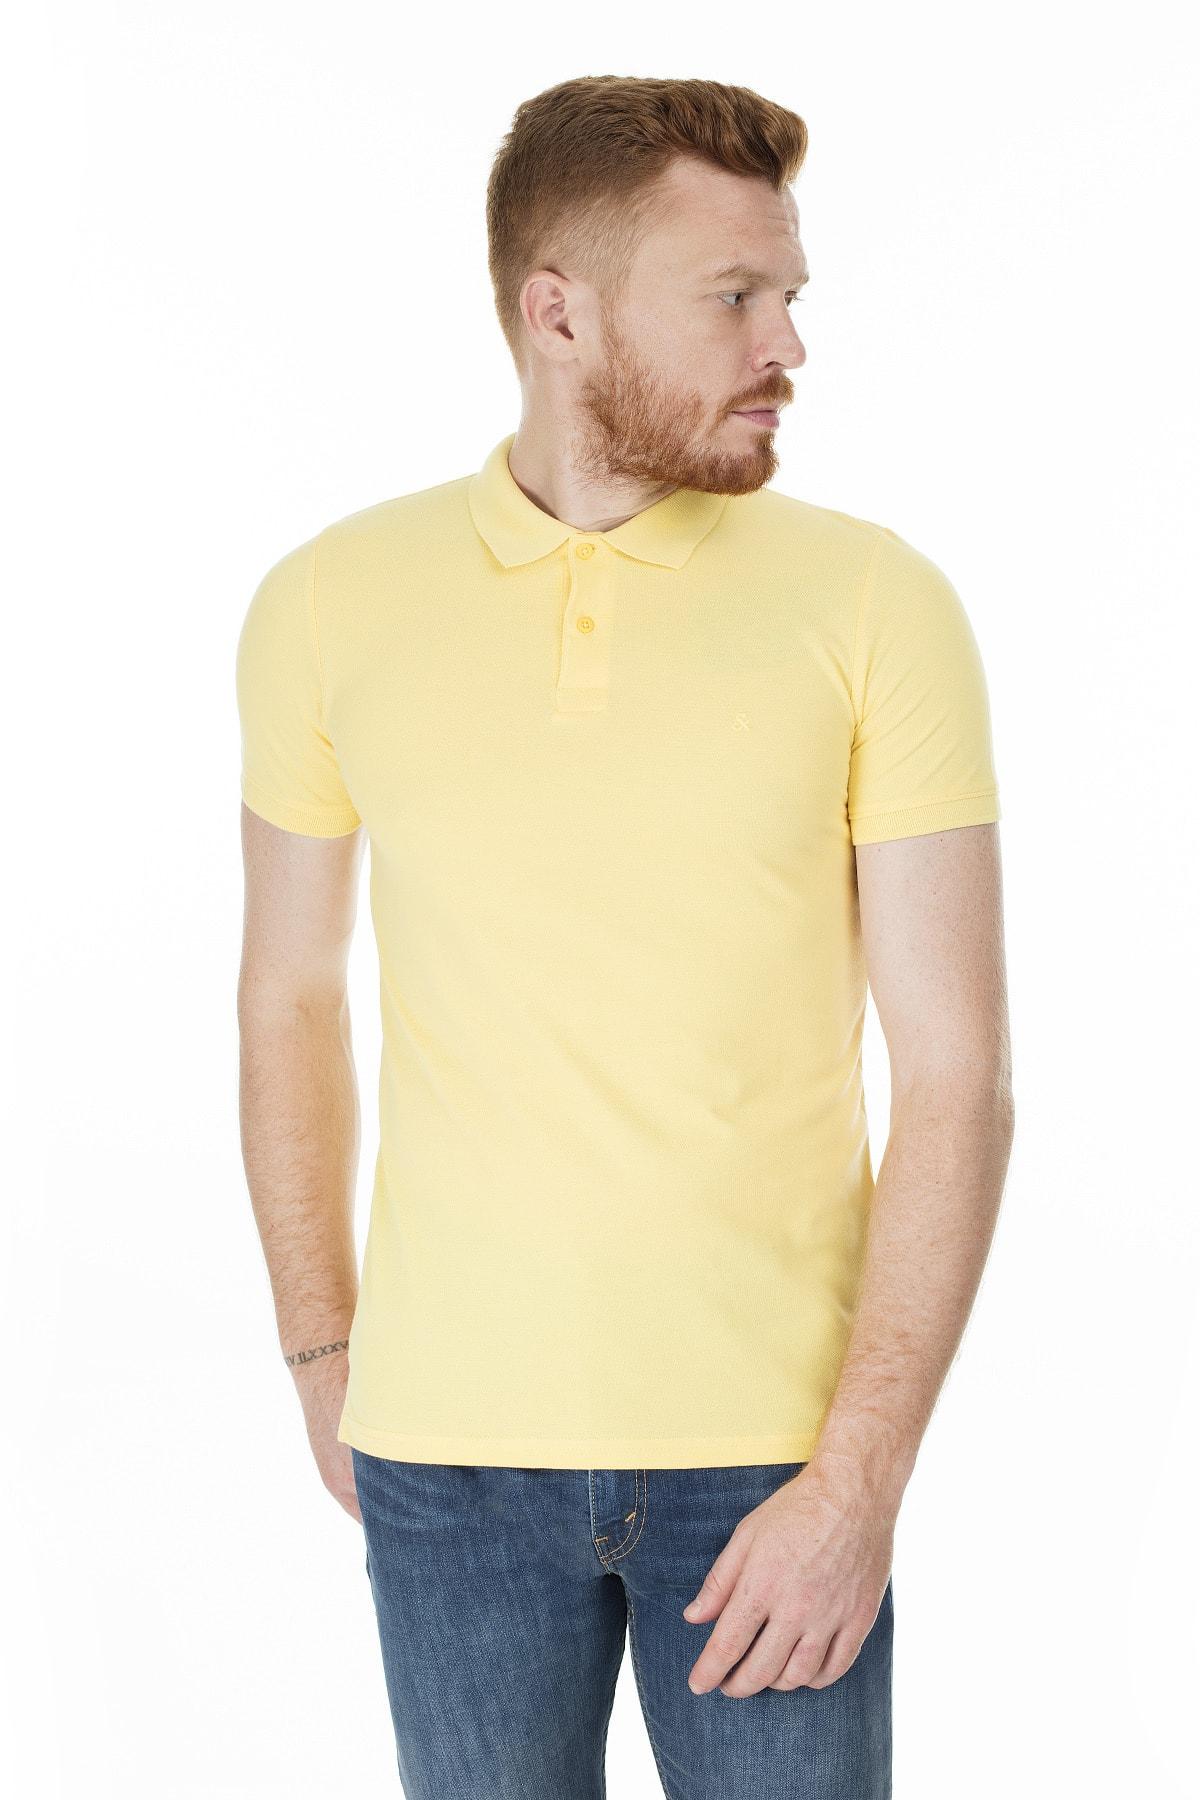 Jack & Jones Slim Fit Essentials Jjebasıc Polo T Shirt ERKEK POLO 121365162 1